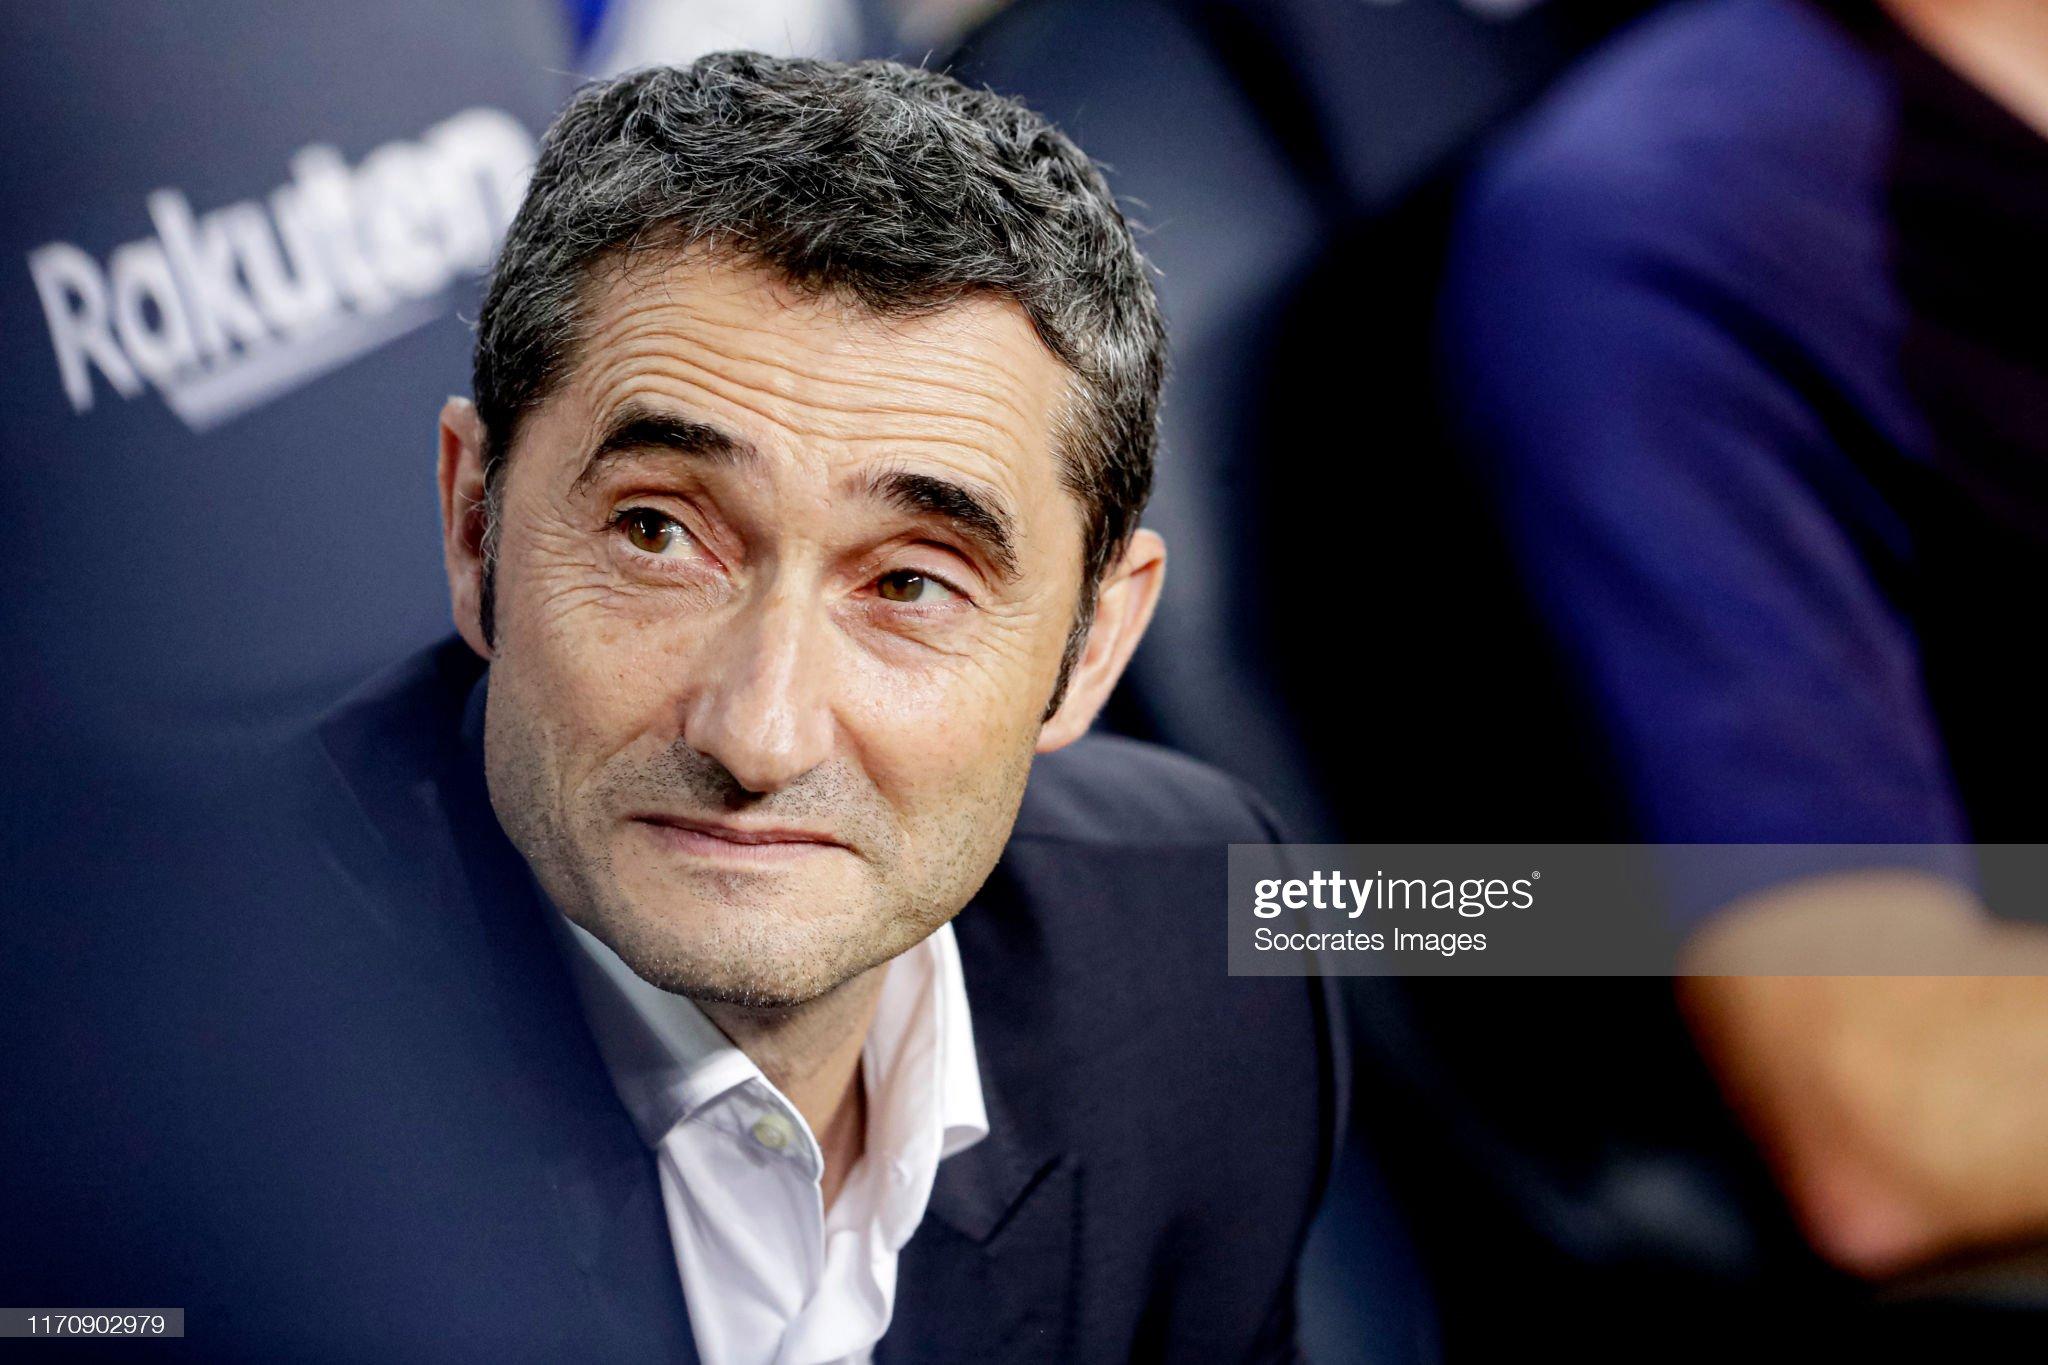 صور مباراة : برشلونة - فياريال 2-1 ( 24-09-2019 )  Coach-ernesto-valverde-of-fc-barcelona-during-the-la-liga-santander-picture-id1170902979?s=2048x2048